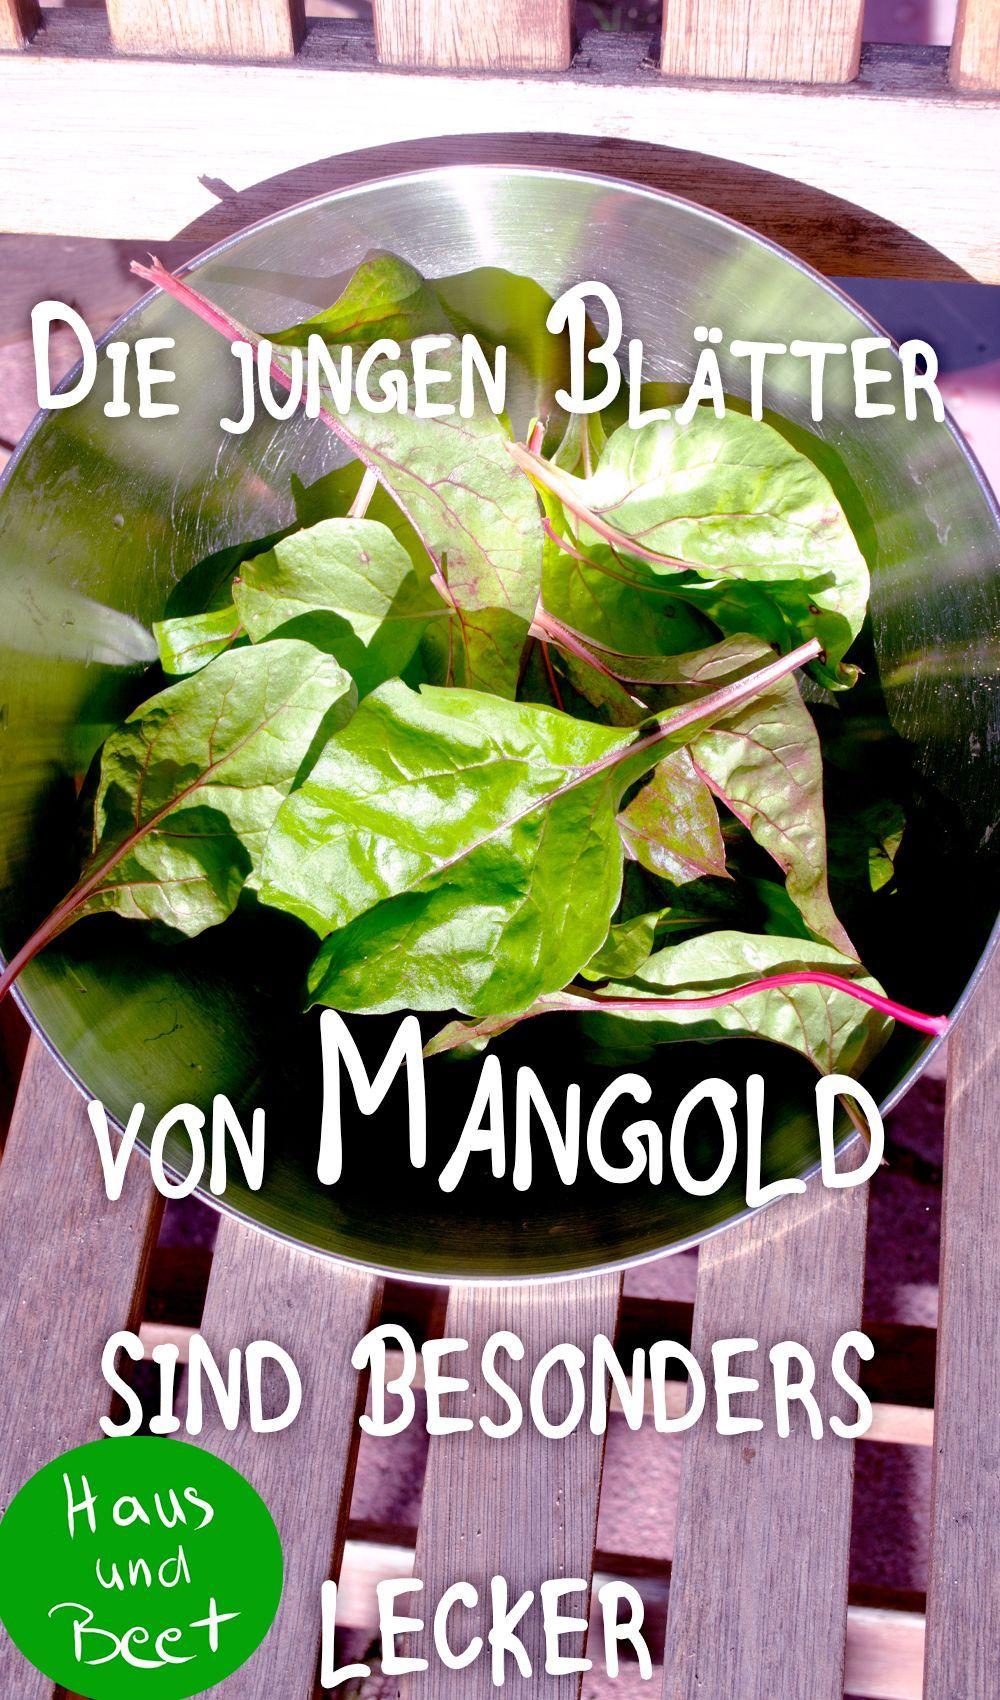 Blattgemuse Das Gesunde Mangold Rezepte Vegetarisch Winter Winter Mangold Das Gesunde Blattgemuse Im Winter Mang Mangold Mangold Rezepte Rezepte